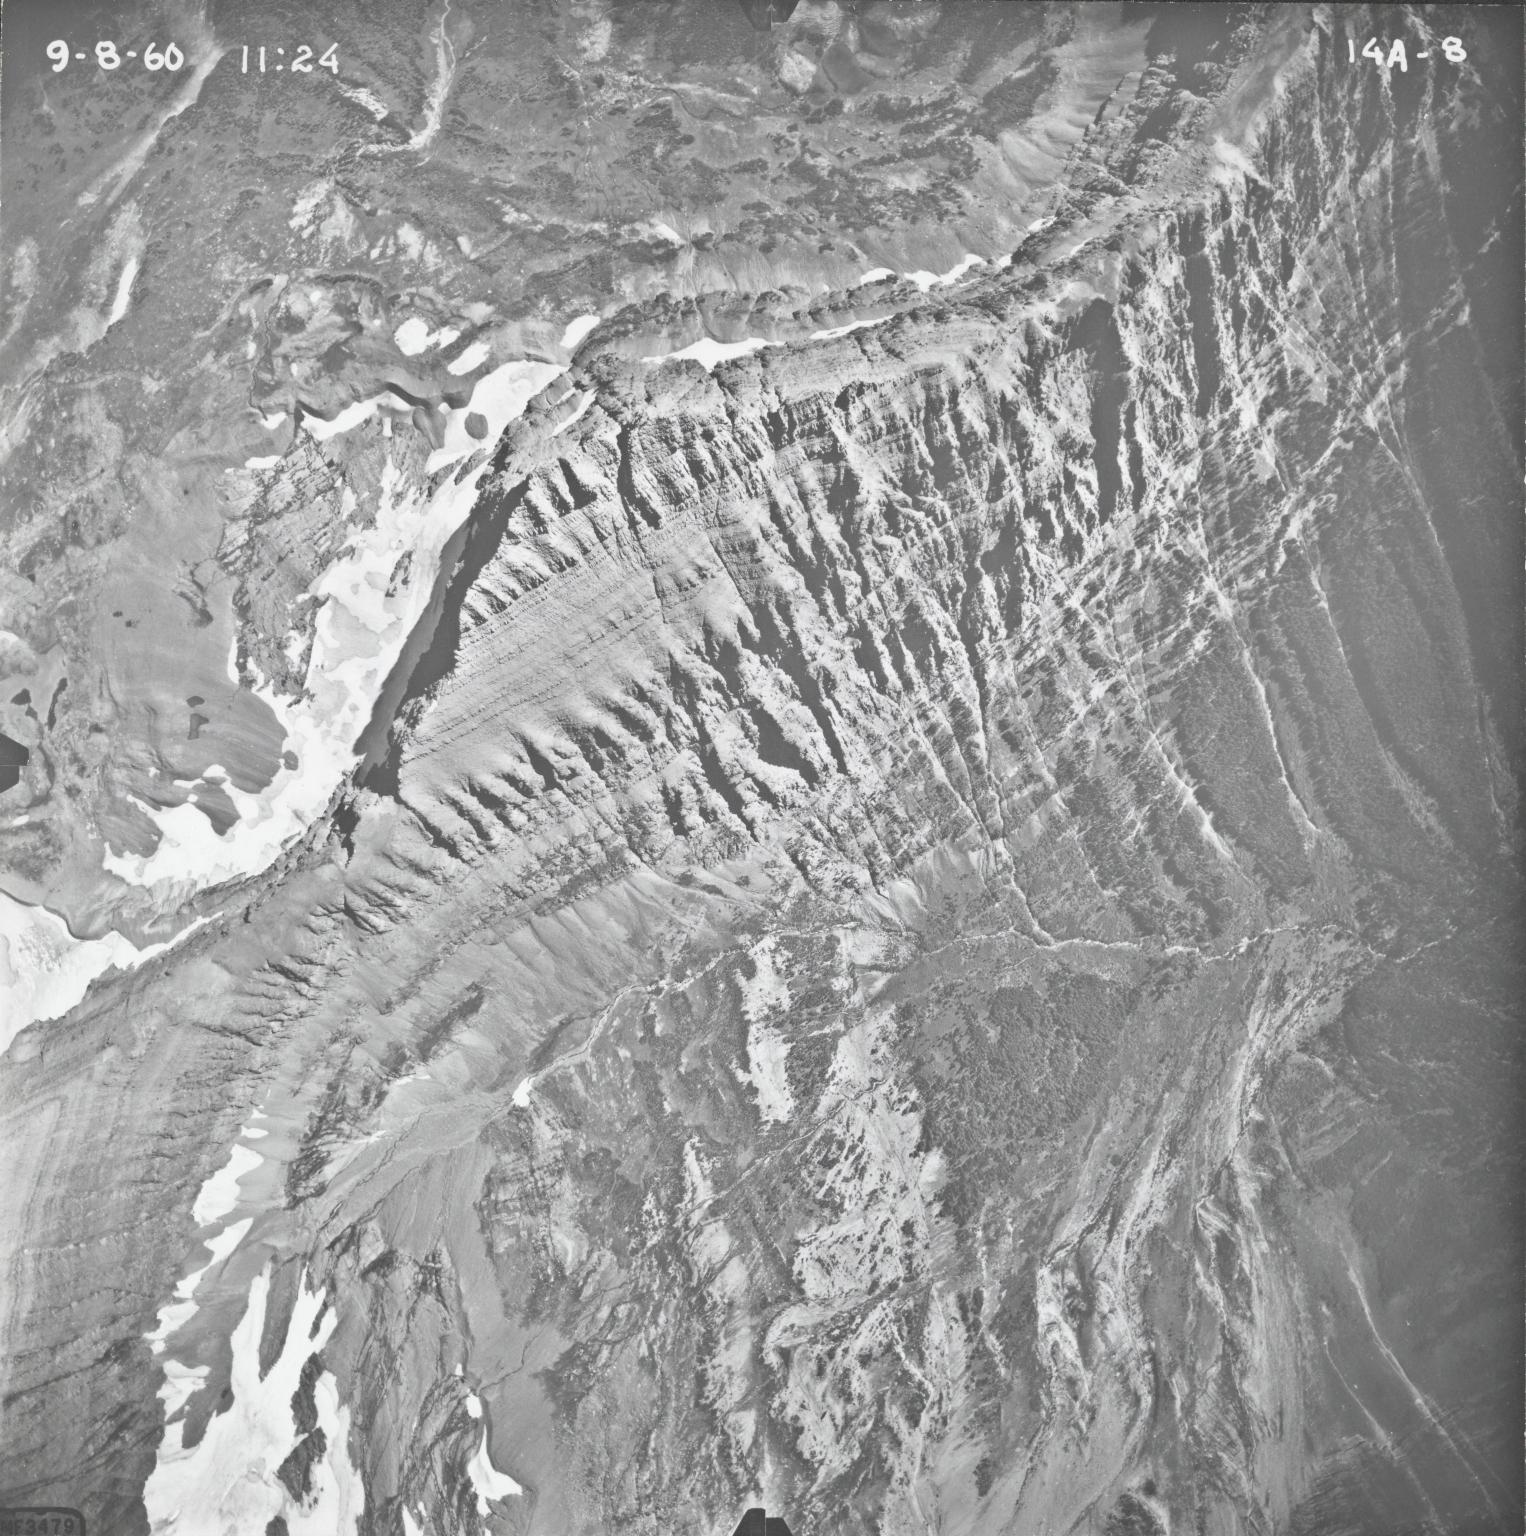 Red Eagle Glacier, aerial photograph FL14A-8, Montana